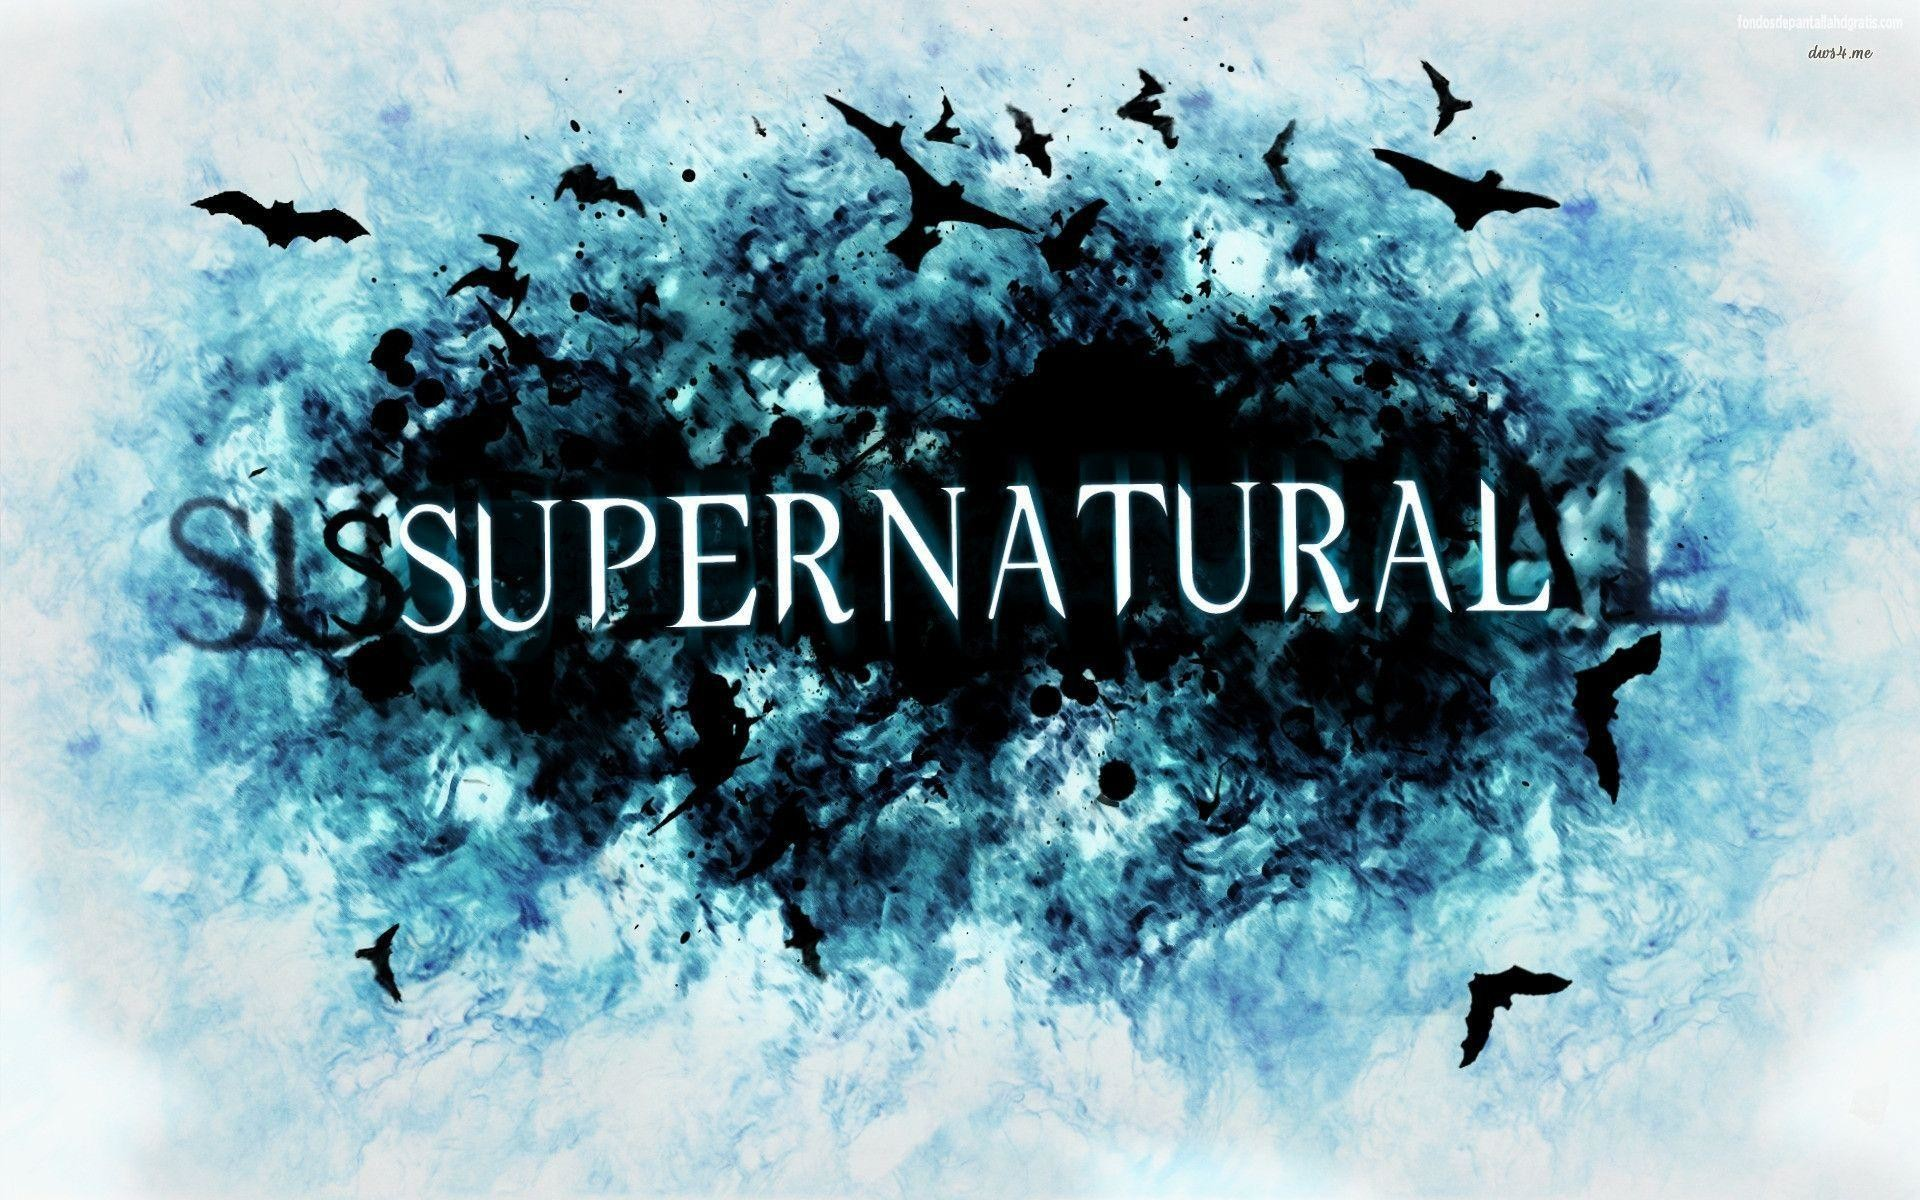 7167-supernatural-1920×1200-movie-wallpaper-20042 supernatural .